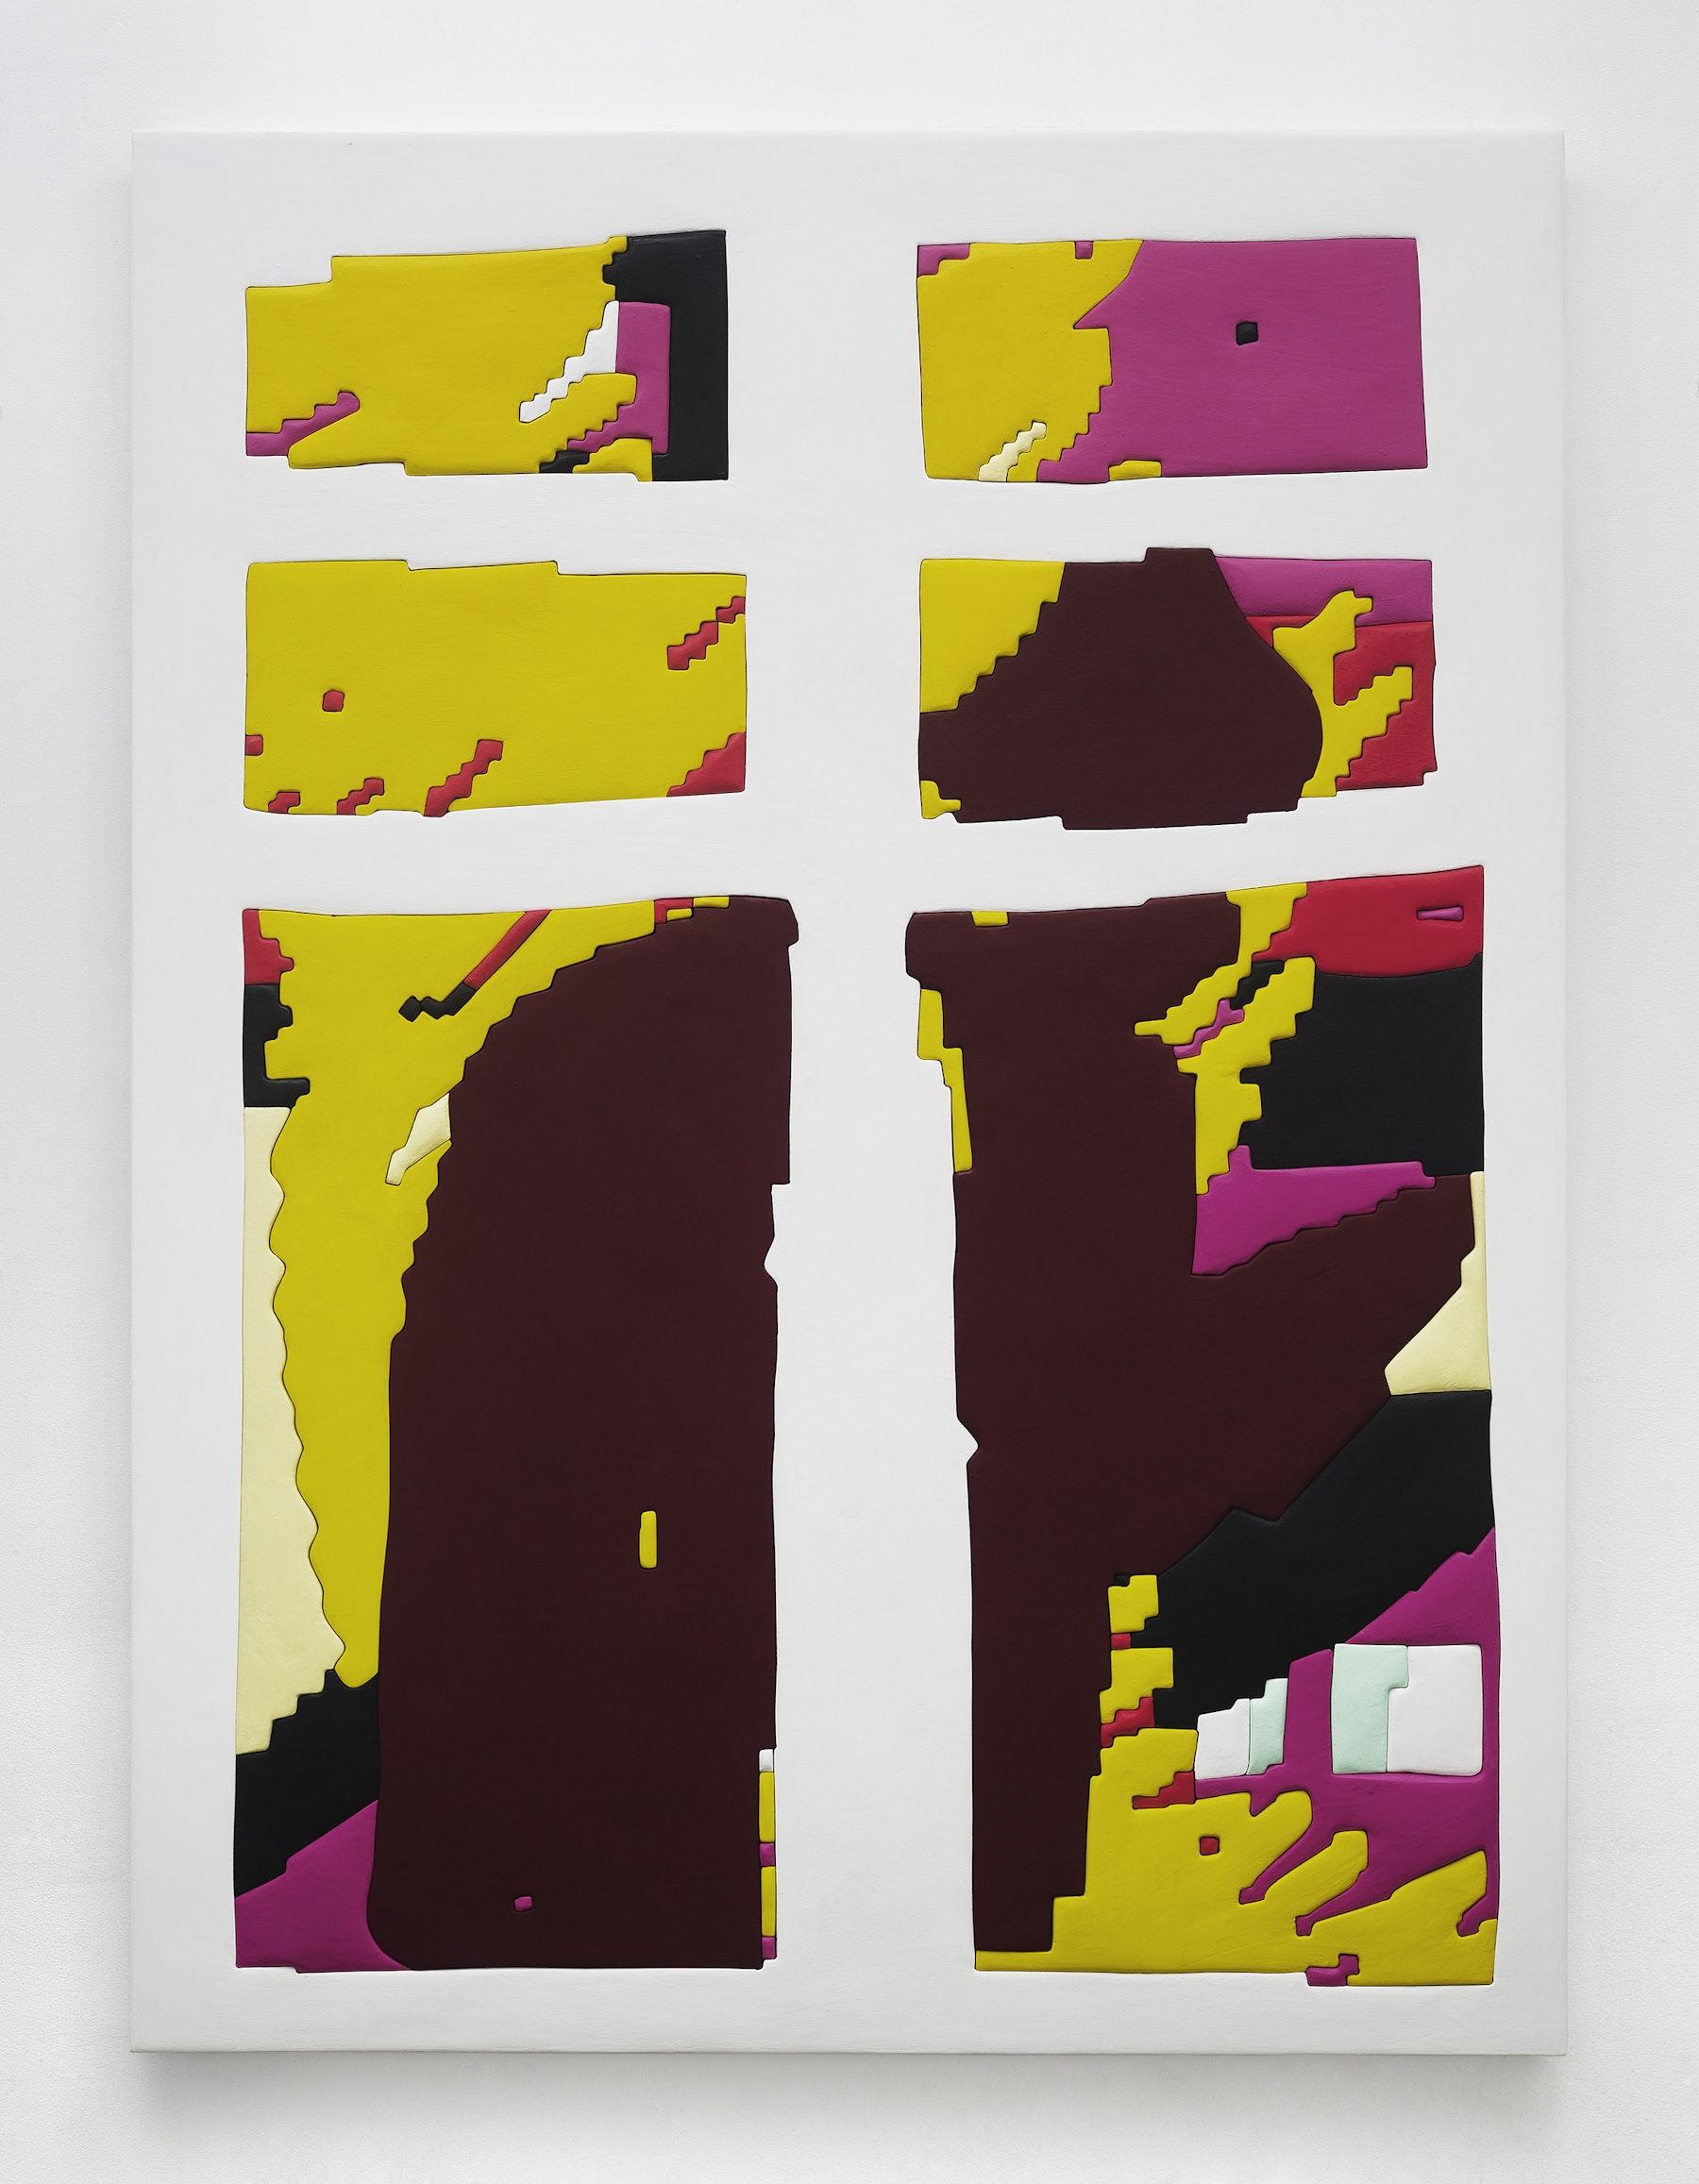 "Sadie Benning ""Window,"" 2019 Wood, aqua resin, casein, and acrylic gouache 71 x 53"" [HxW] (180.34 x 134.62 cm) Inventory #BEN868 Courtesy of the artist and Vielmetter Los Angeles Photo credit: Chris Austin"